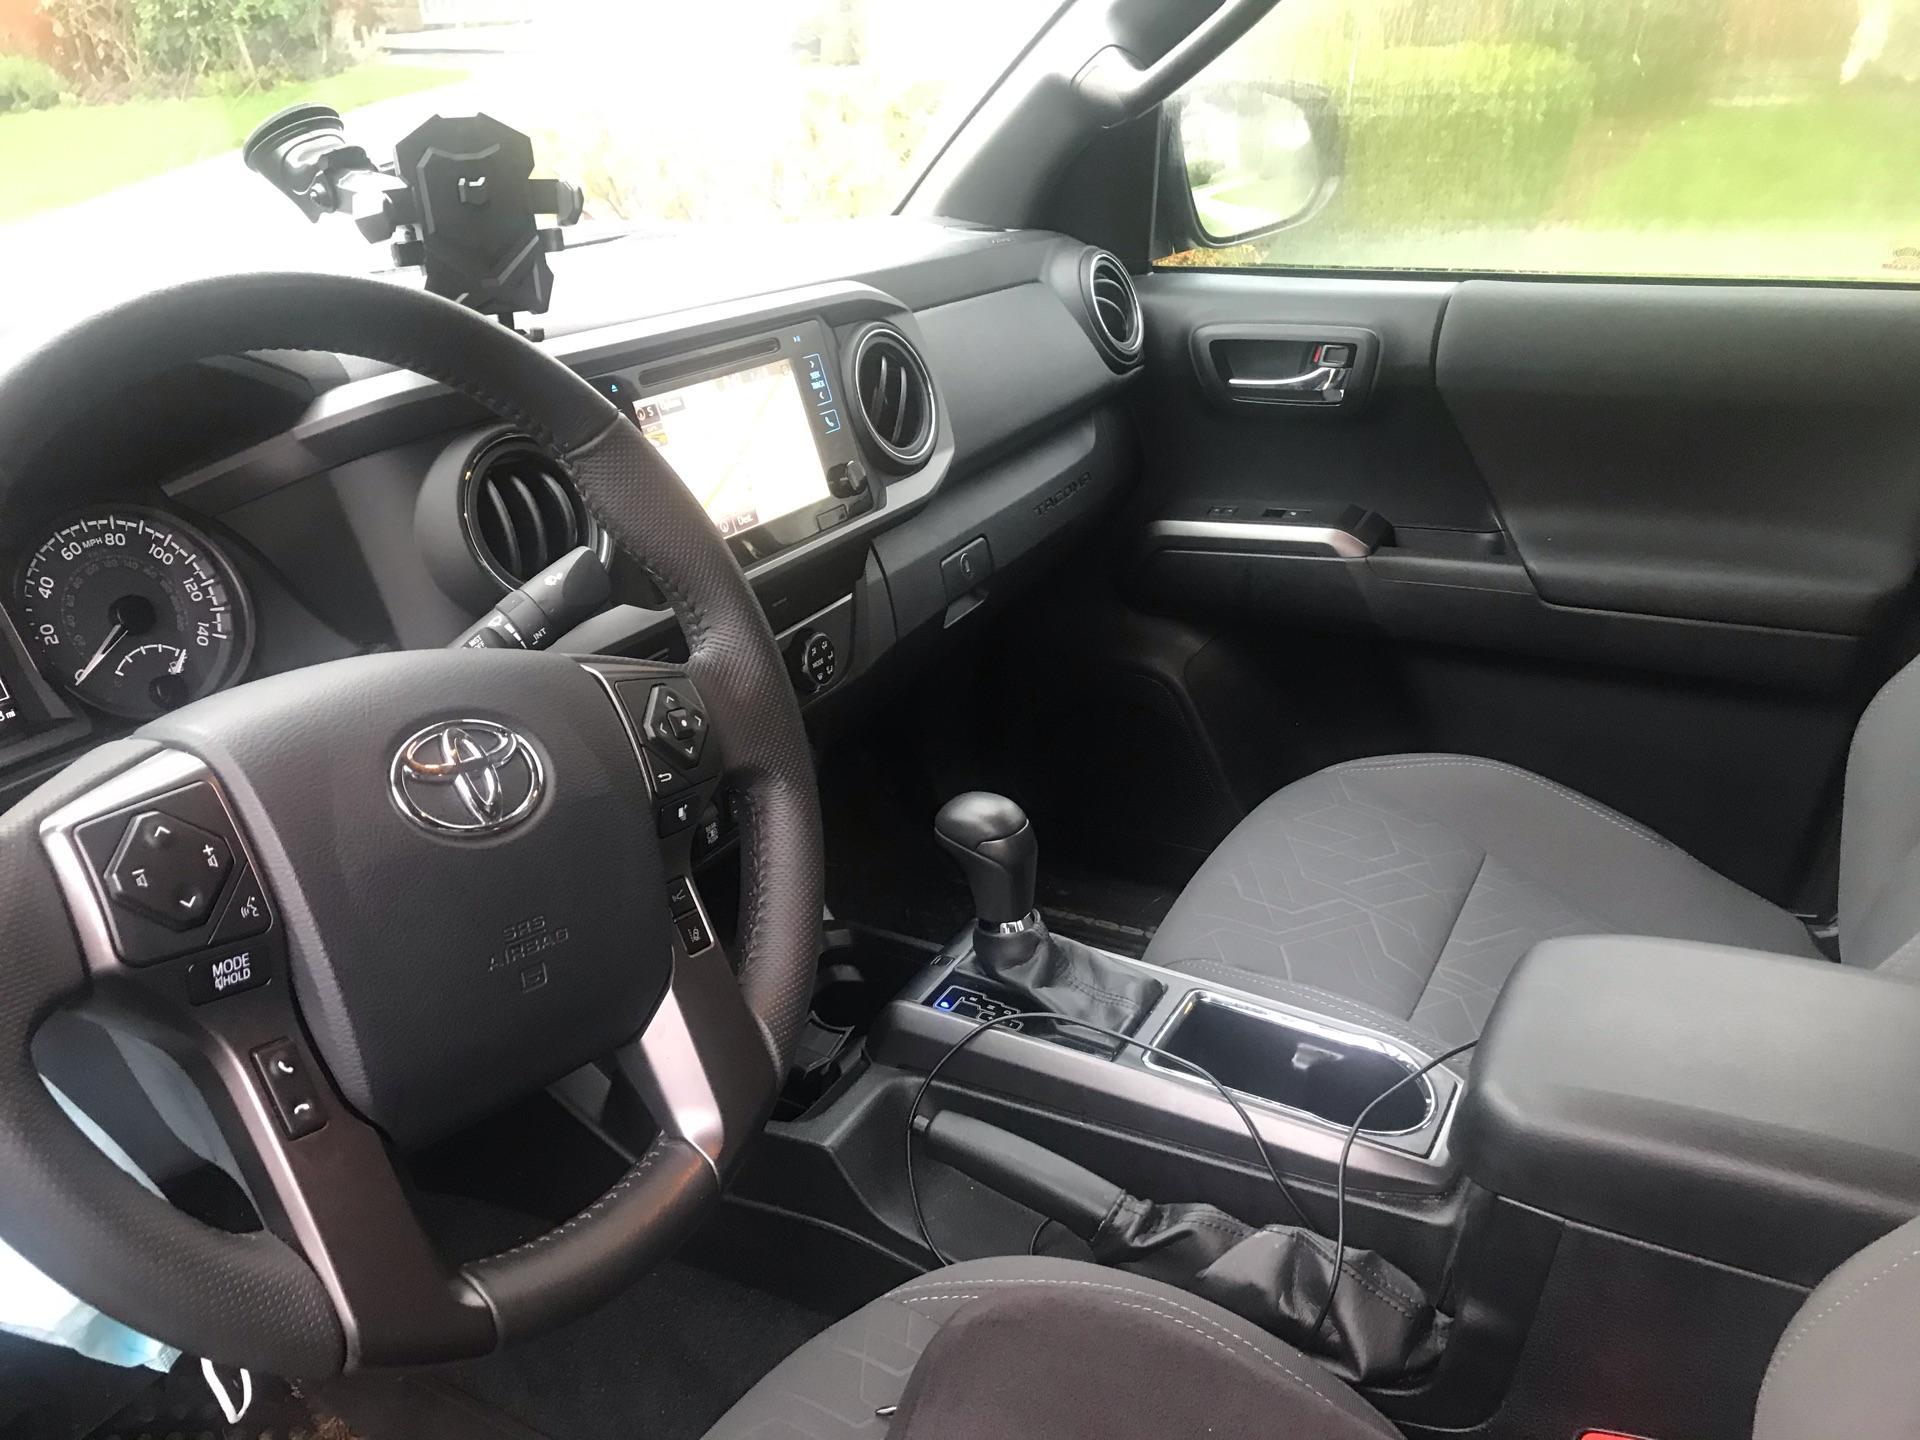 2019 Toyota Tacoma - photo 4